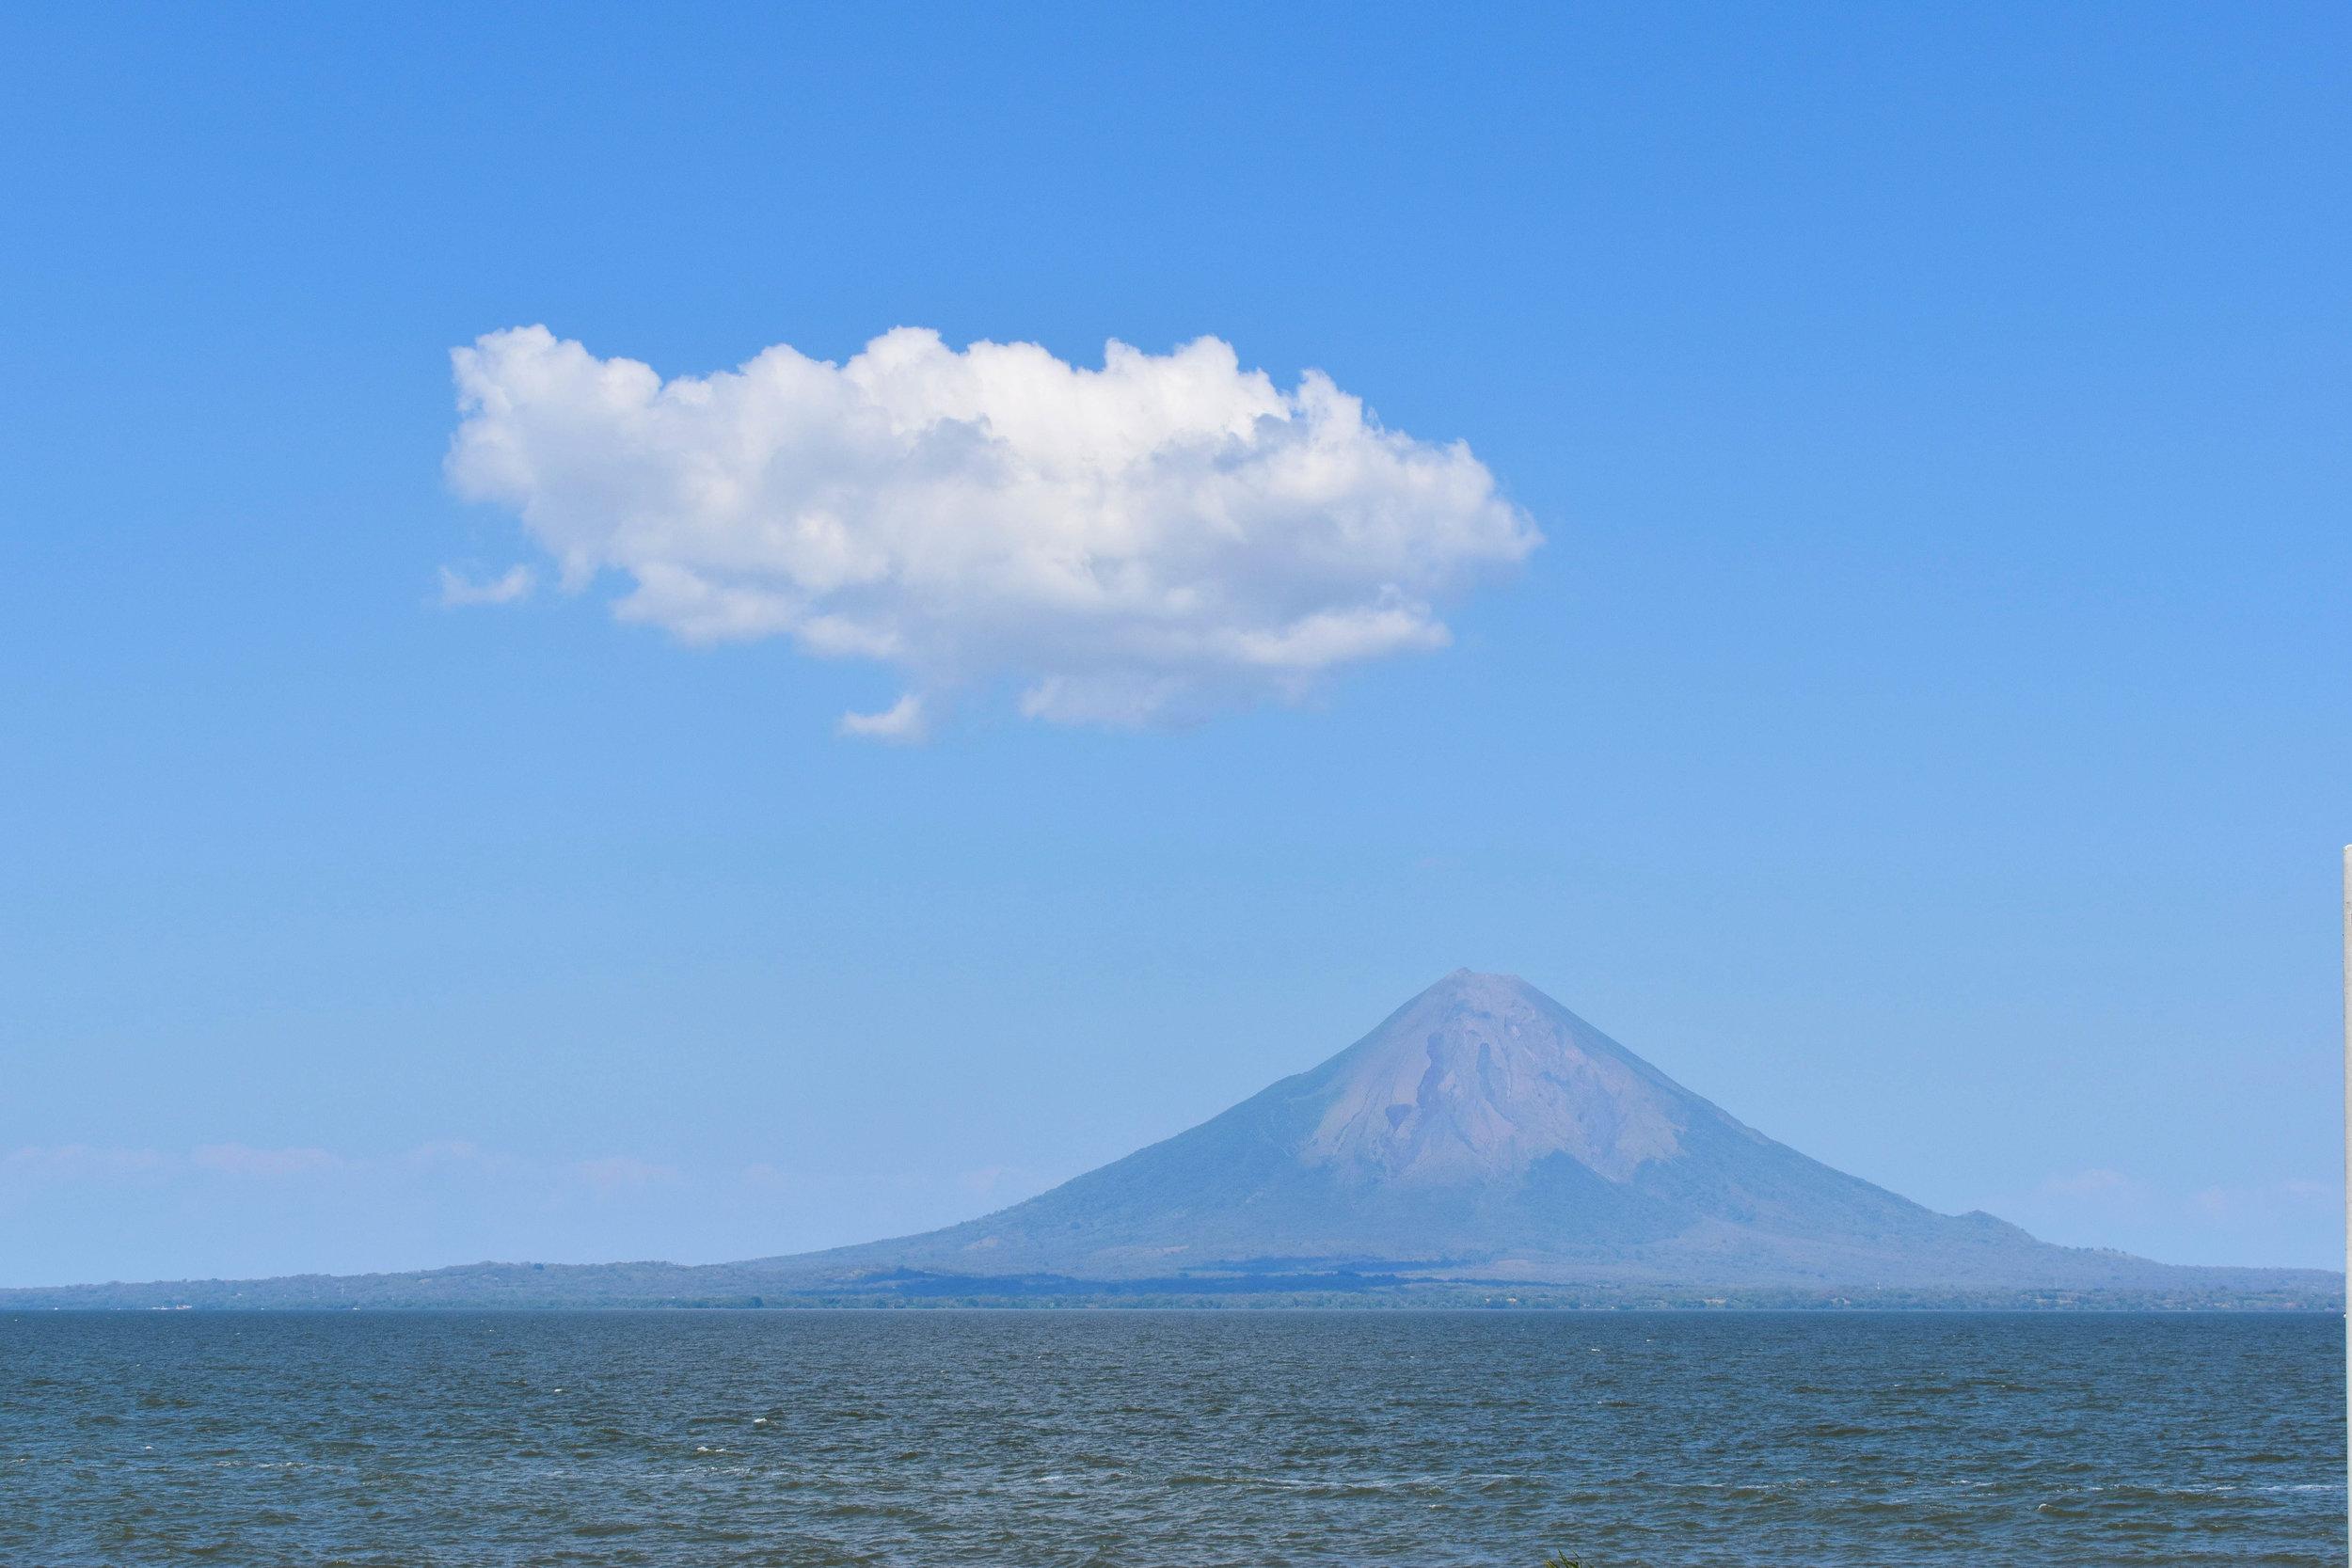 Volcano Concepción on Isle de Ometepe in Nicaragua